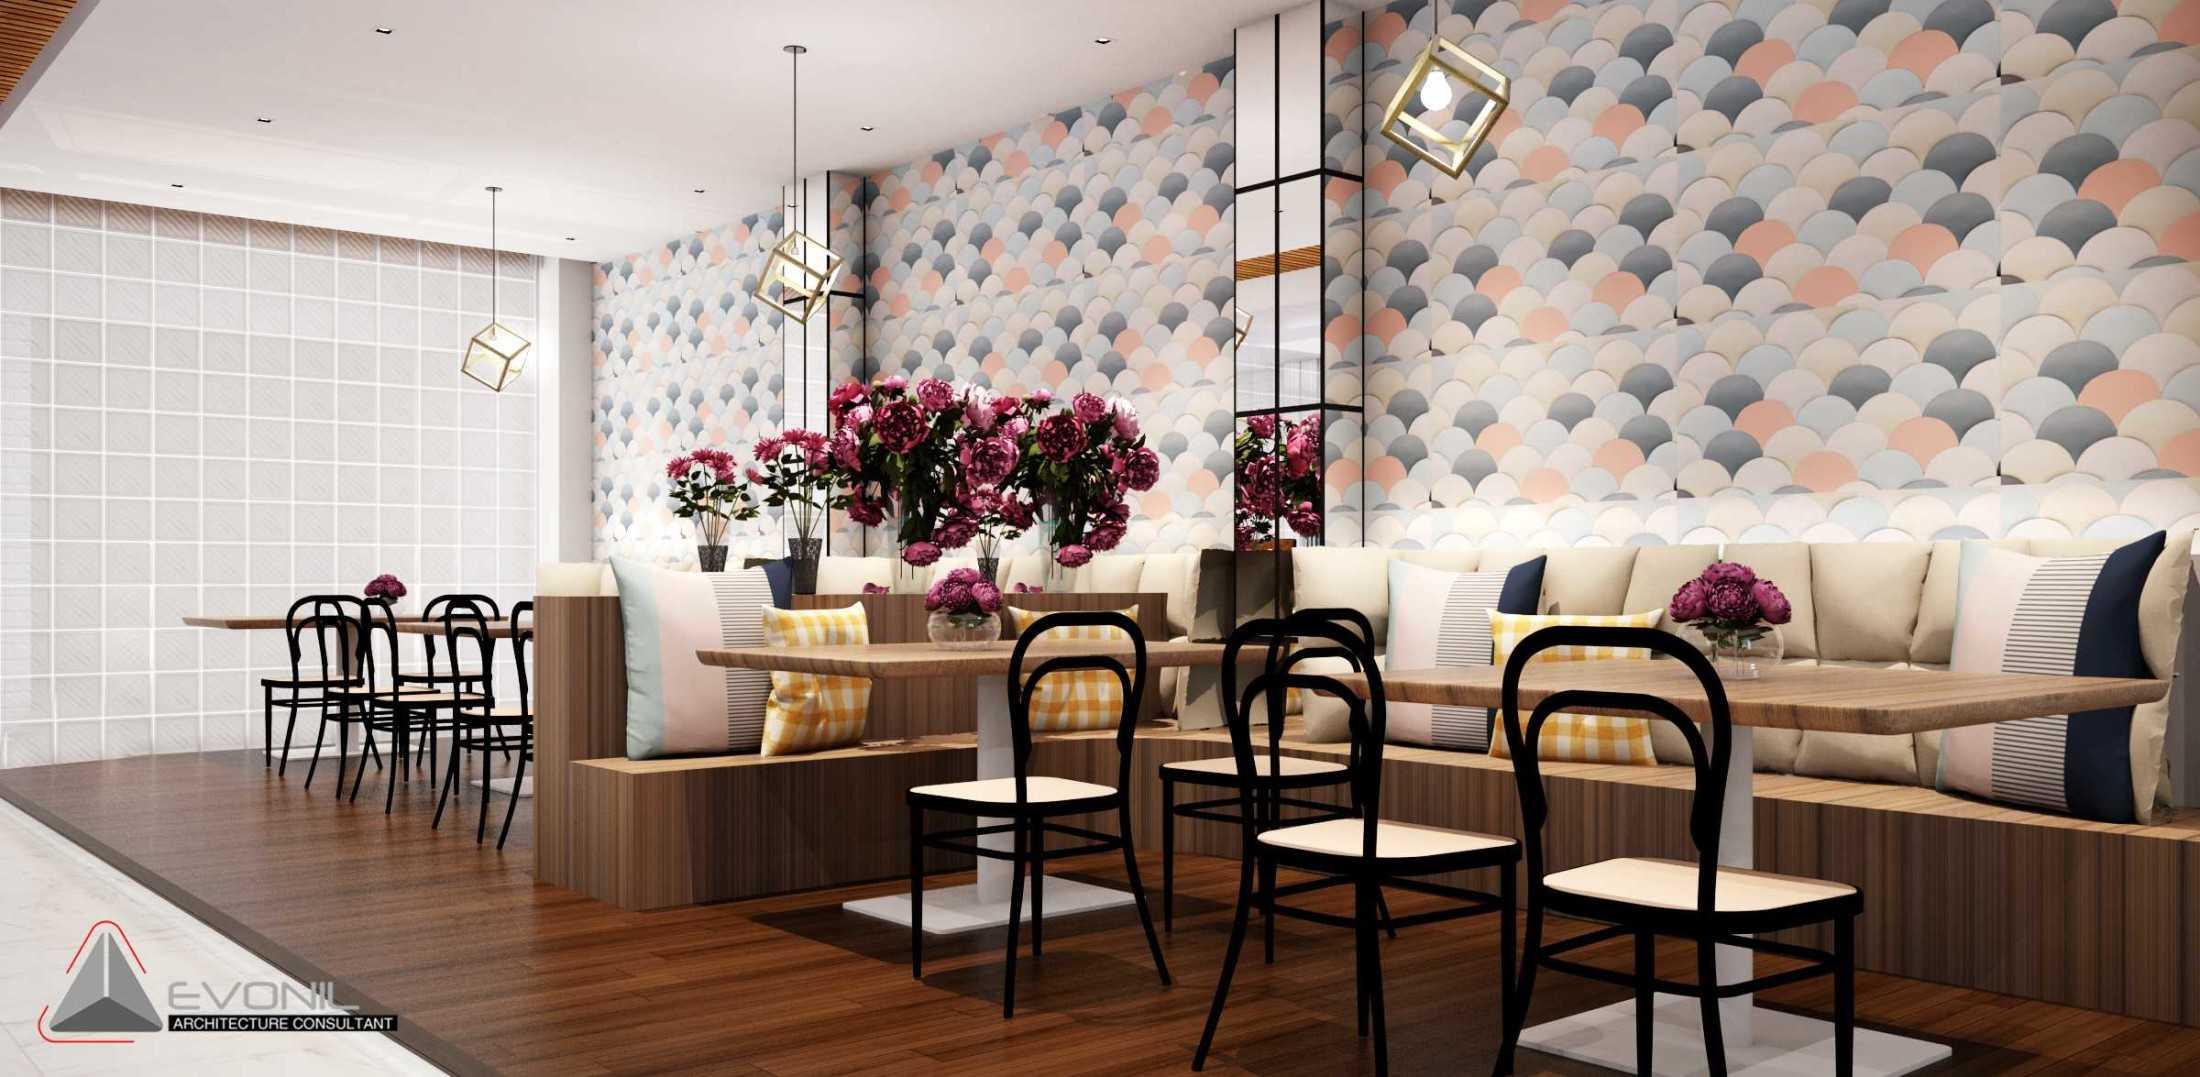 Evonil Architecture Joyful Bakery - Makassar Makassar, Kota Makassar, Sulawesi Selatan, Indonesia Makassar, Kota Makassar, Sulawesi Selatan, Indonesia Evonil-Architecture-Joyful-Bakery-Makassar  77969